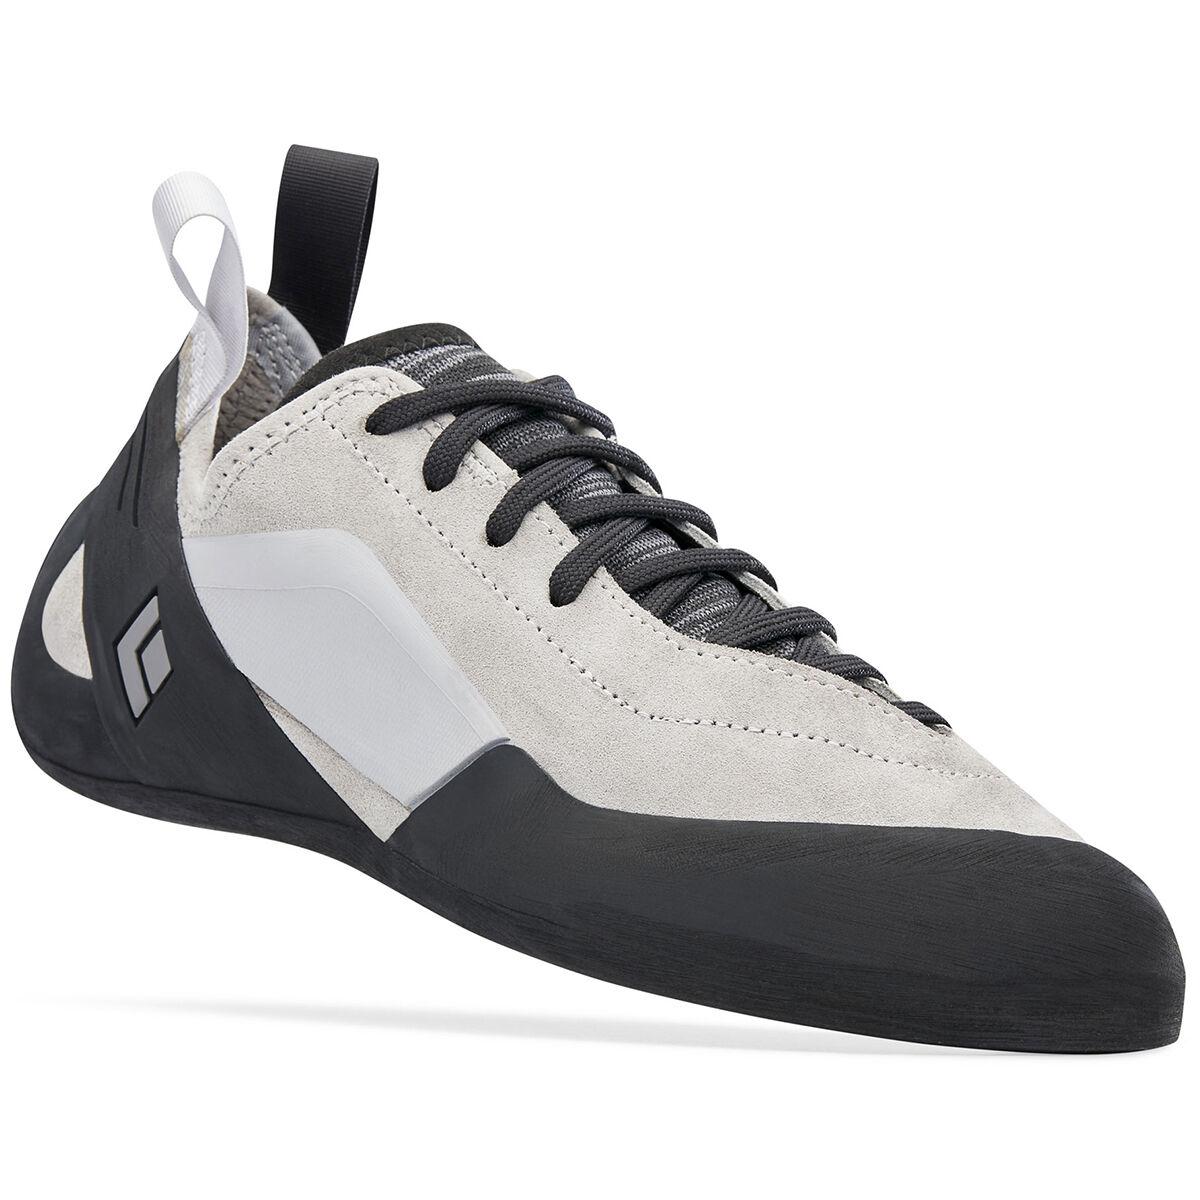 Black Diamond Men's Aspect Climbing Shoes - Size 8.5